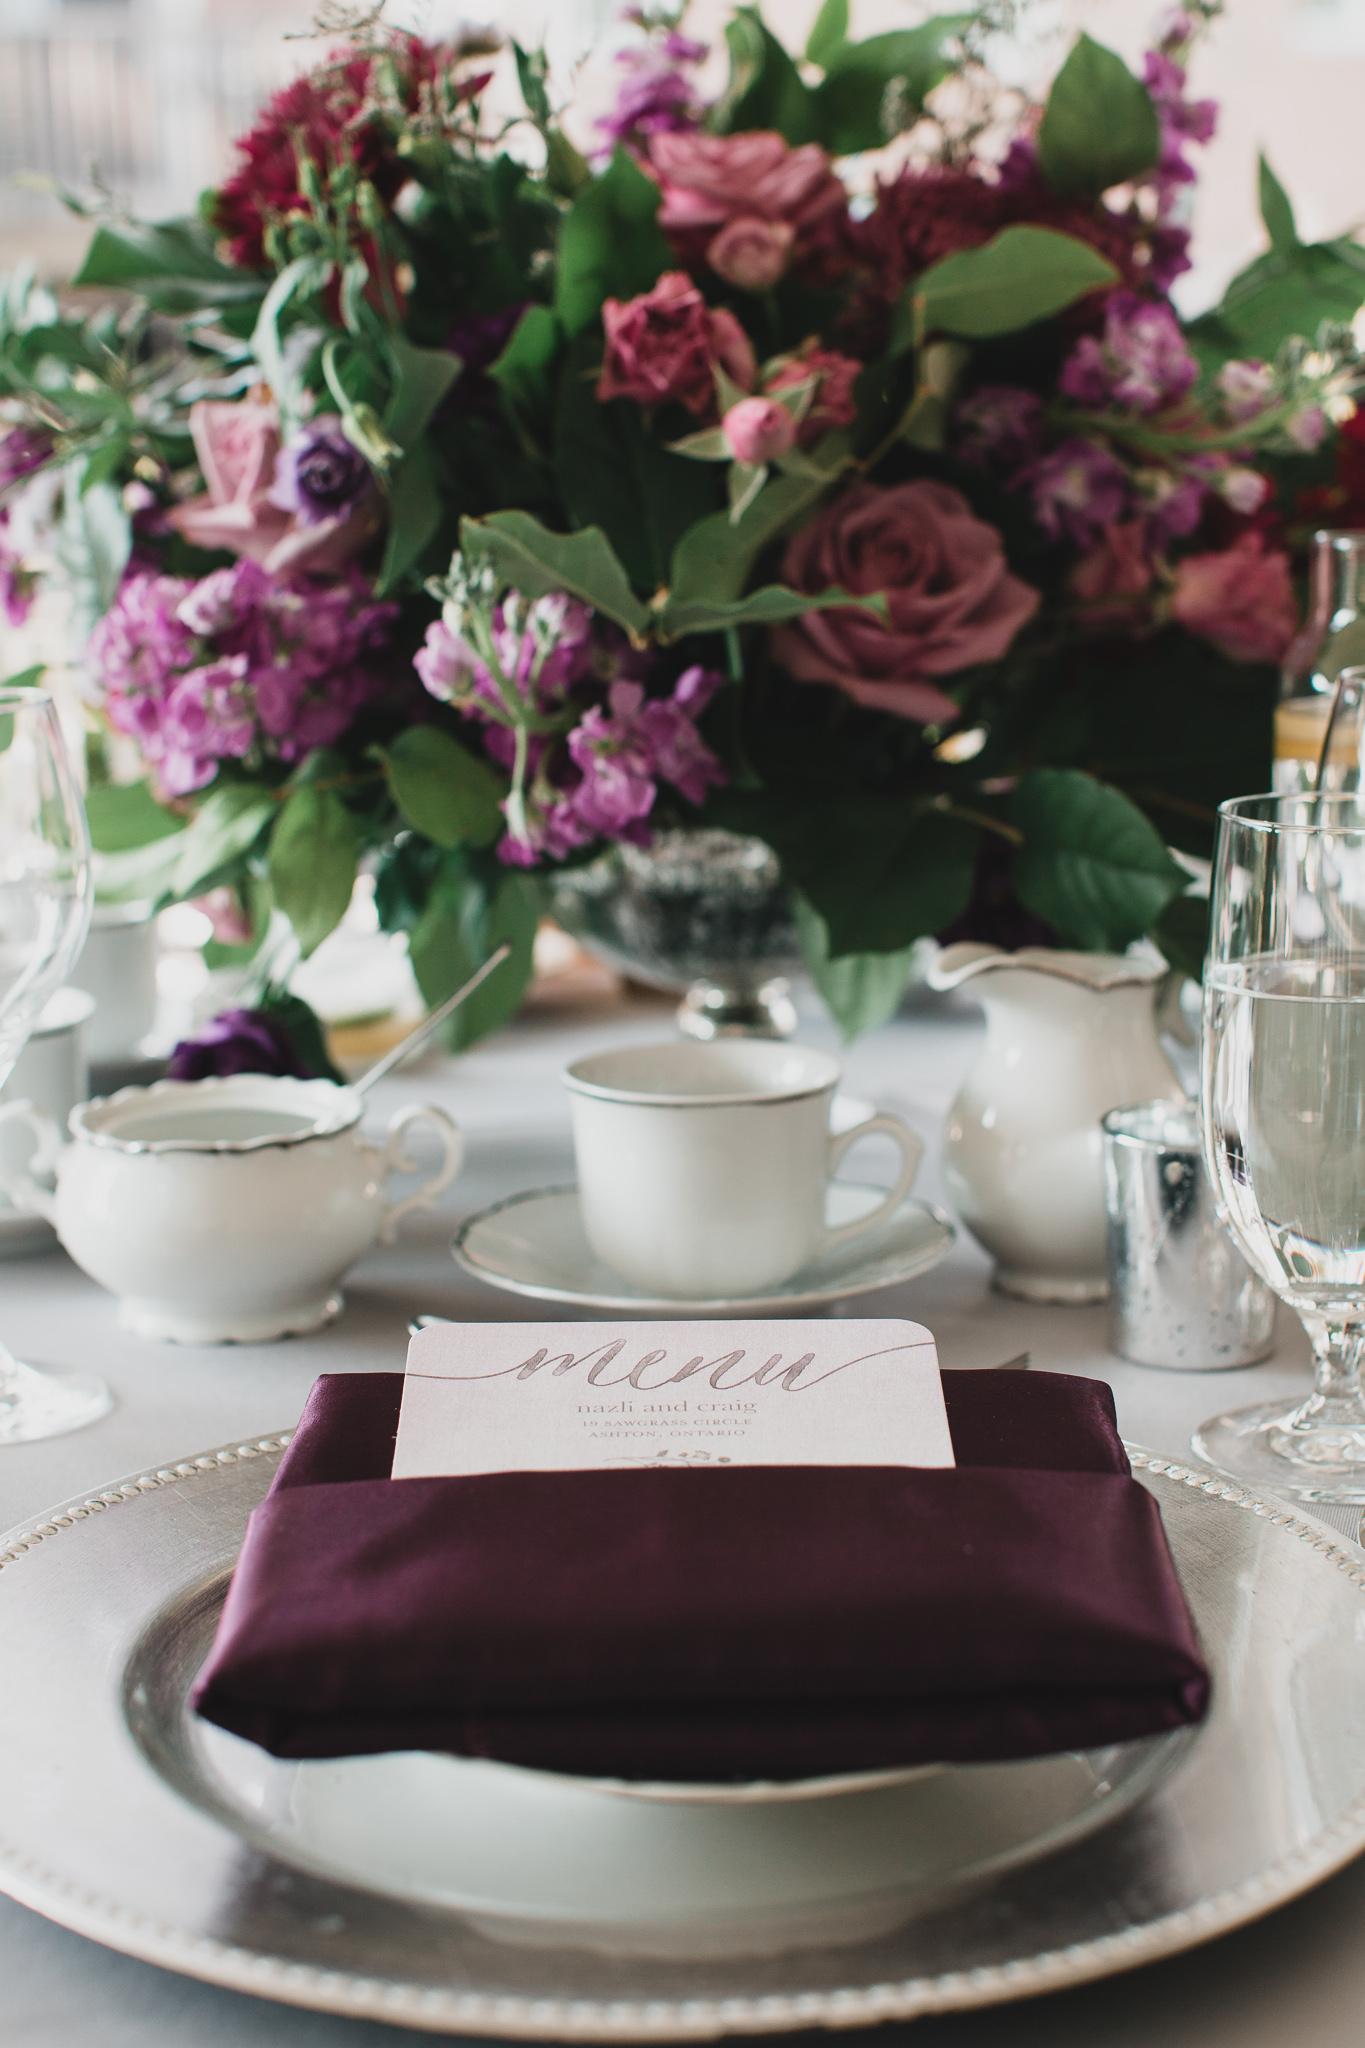 Satin & Snow Floral Design Wedding